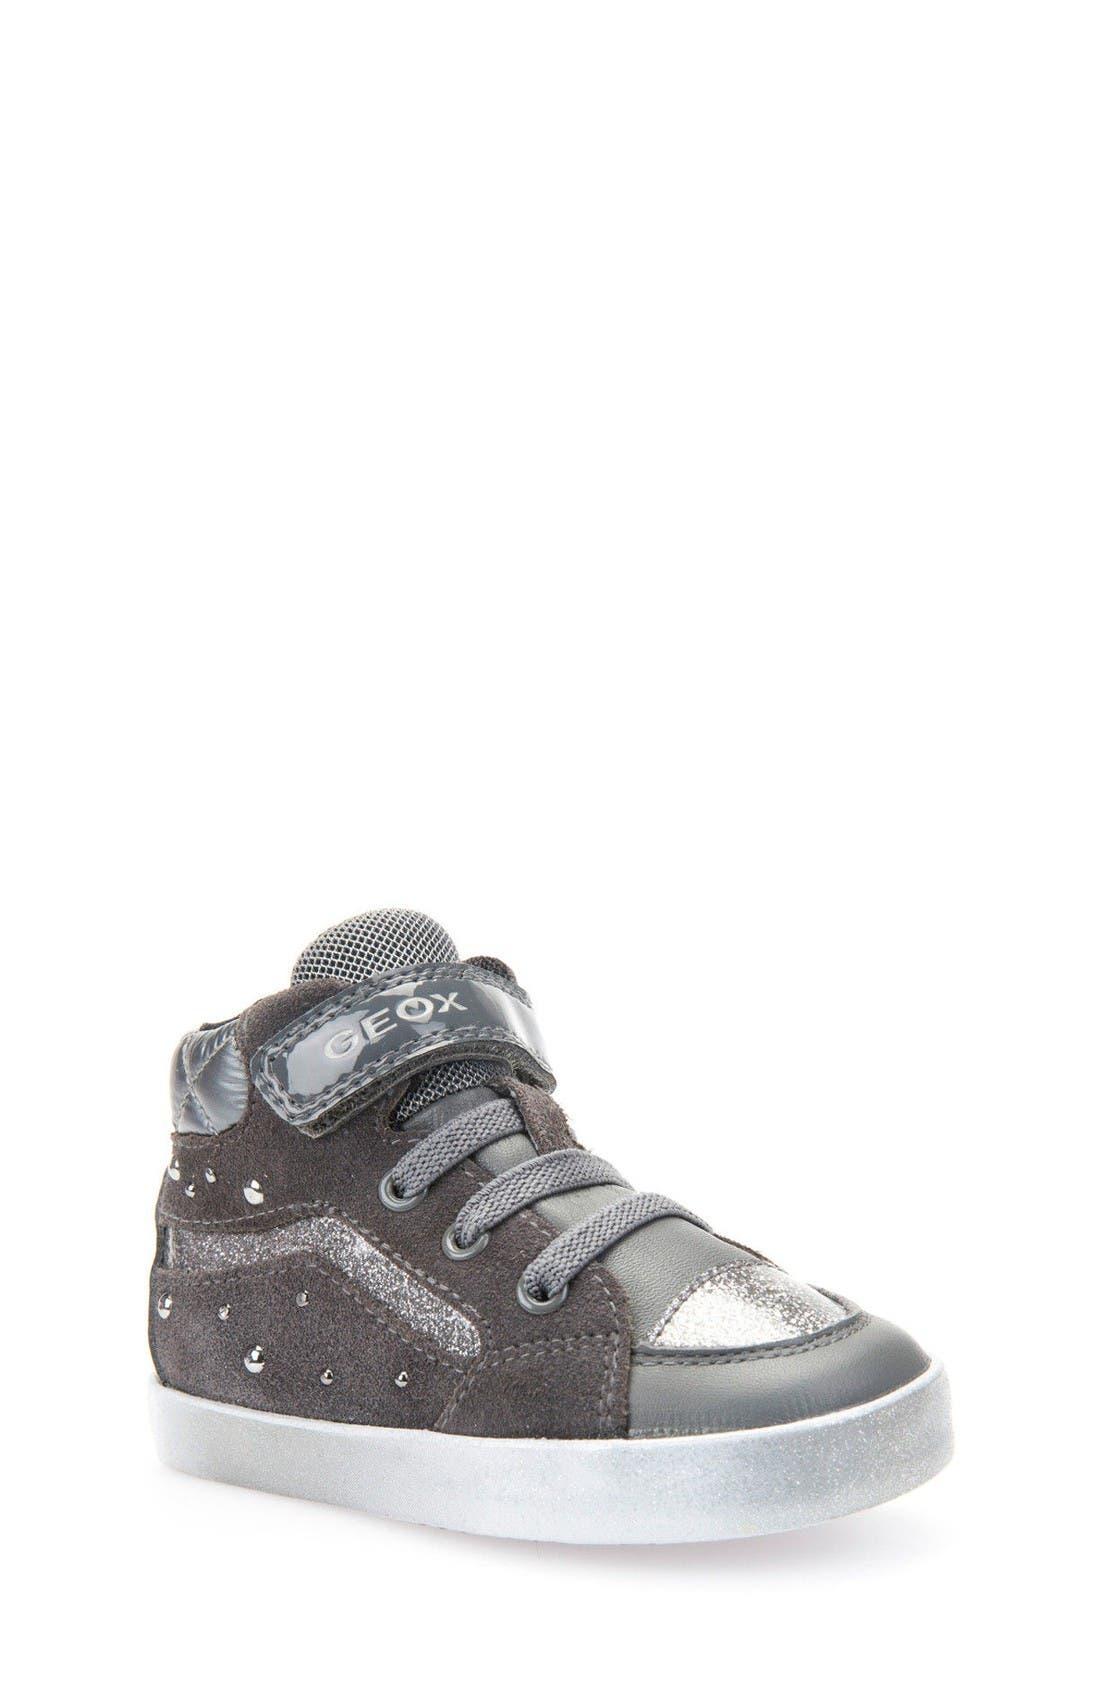 Alternate Image 1 Selected - Geox Kiwi Studded High Top Sneaker (Walker & Toddler)